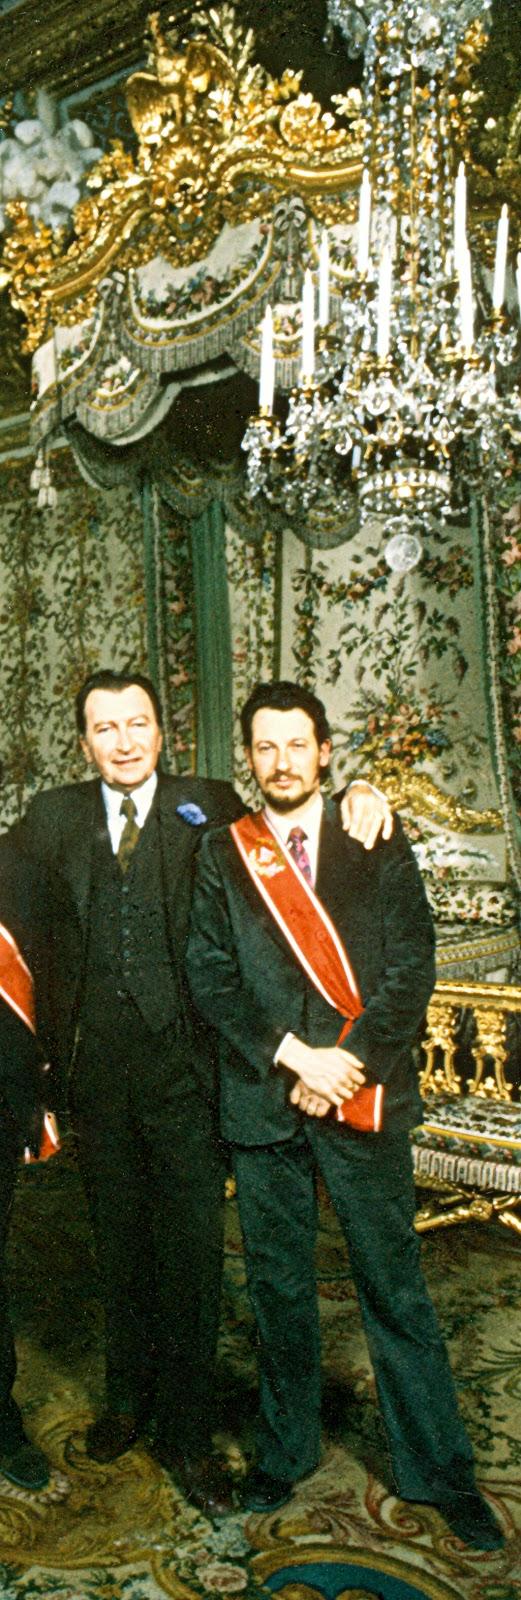 Gérald Van der Kemp et Daniel Sievert